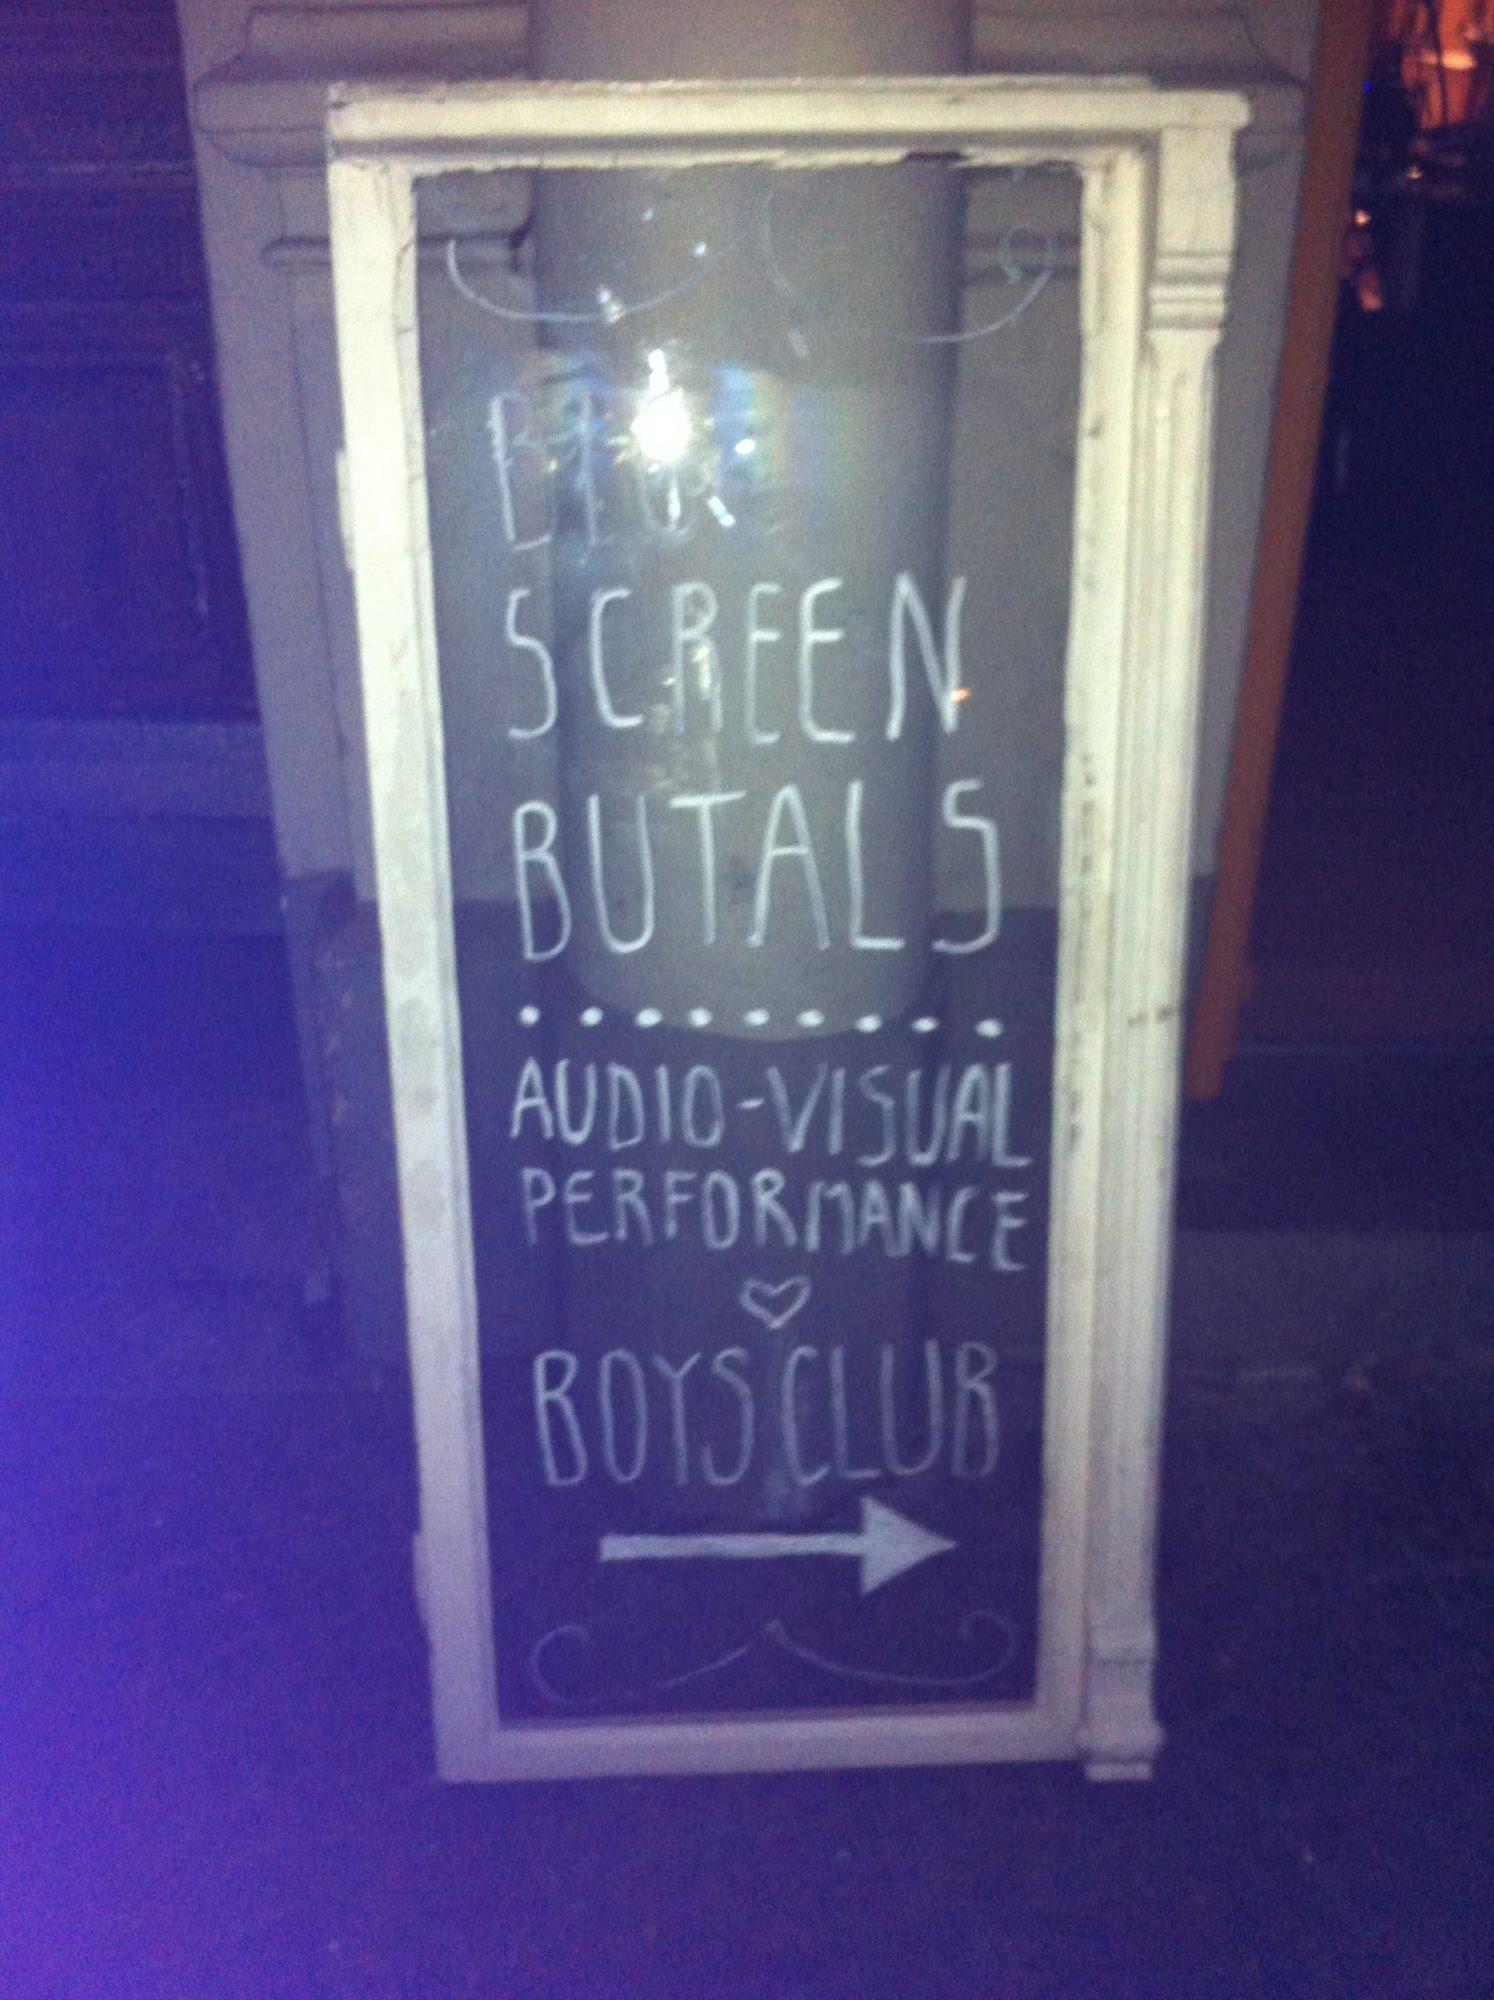 Big Screen Brutals – 5 September 2014 @ Boys Club – The Superusers, Kris Limbach, VJ Meat, Crocanti – 2014